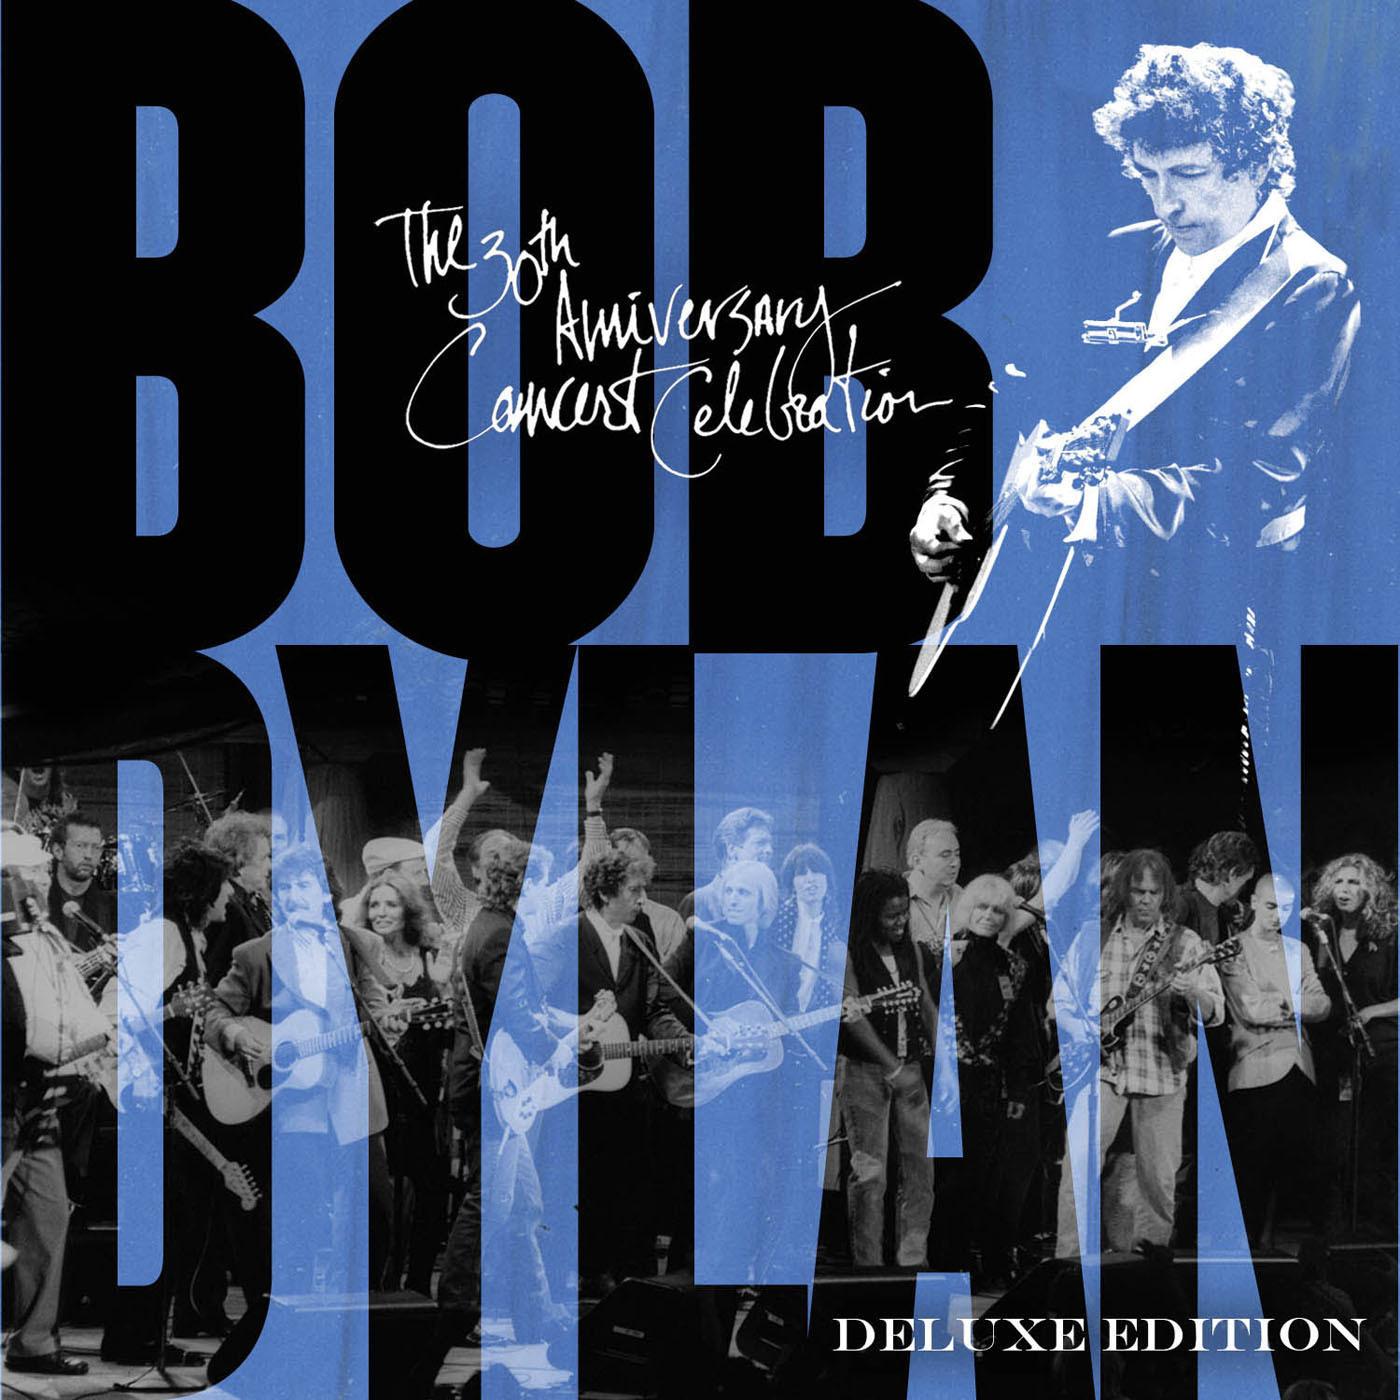 Bob Dylan - The 30th Anniversary Concert Celebration Heading to DVD/Blu-ray 3/4